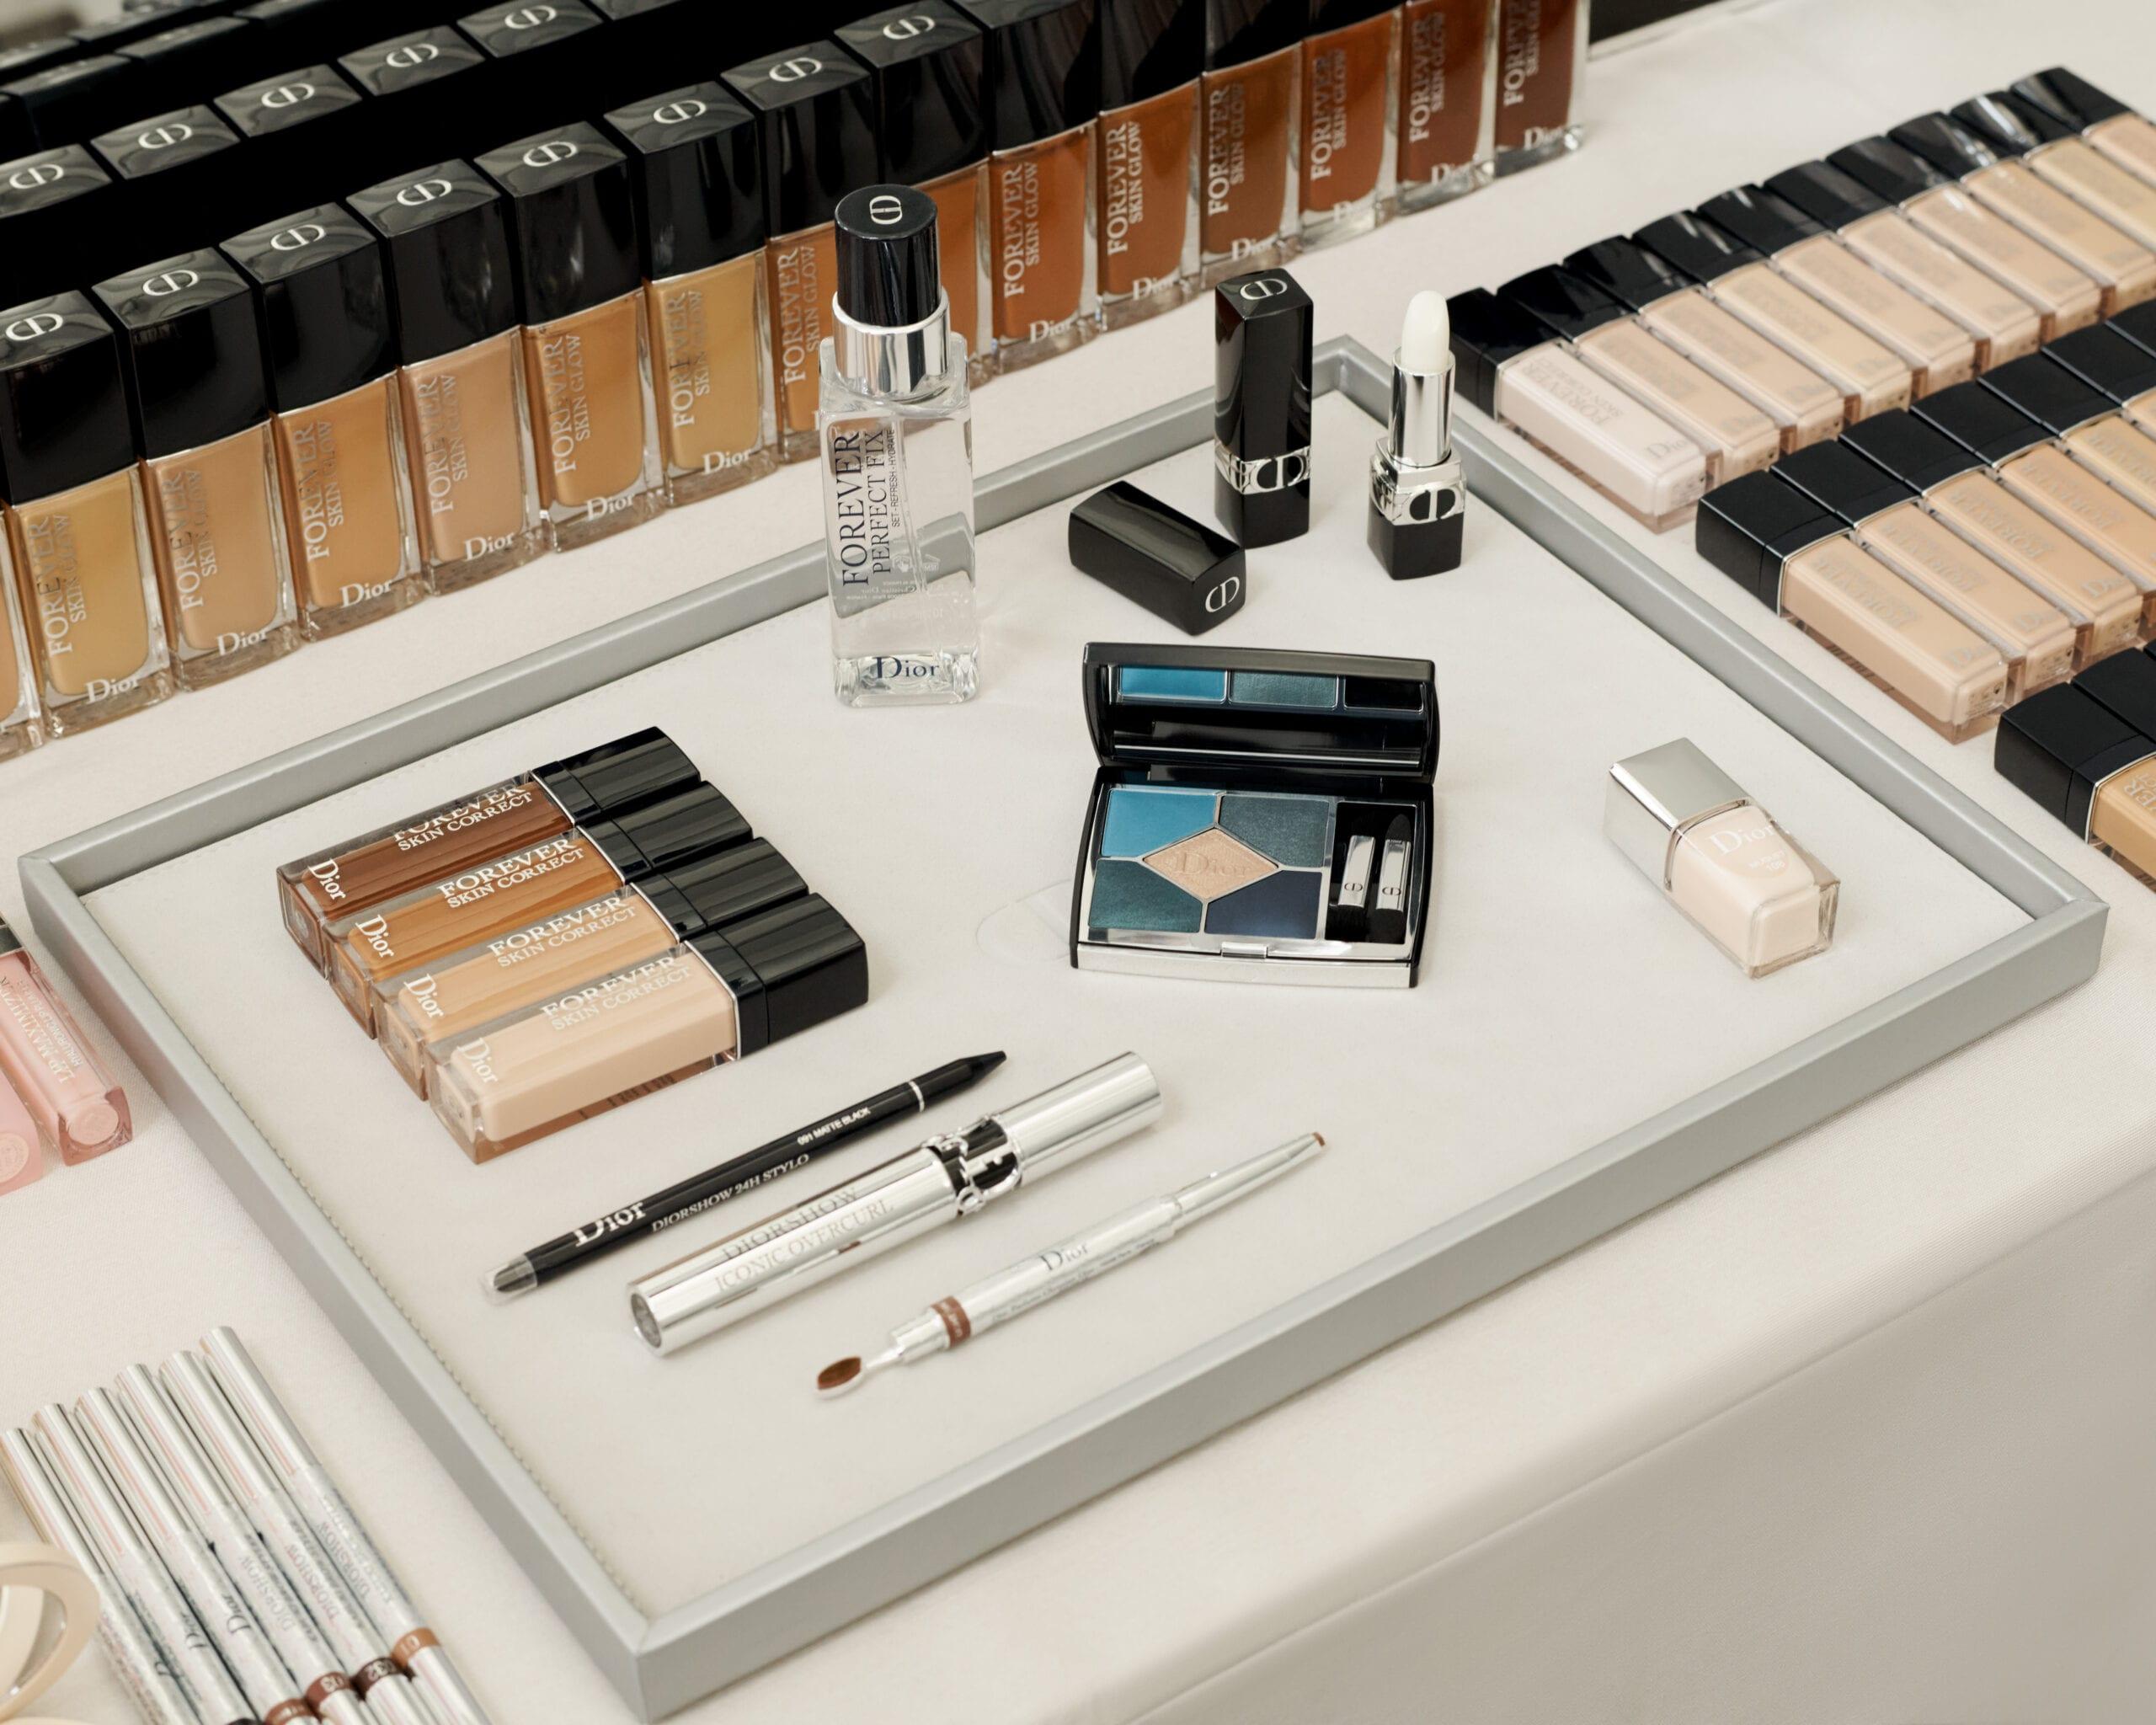 Dior: Το μακιγιάζ της συλλογής υψηλής ραπτικής Φθινόπωρο/Χειμώνας 2021/2022 είχε επίκεντρο τα μάτια